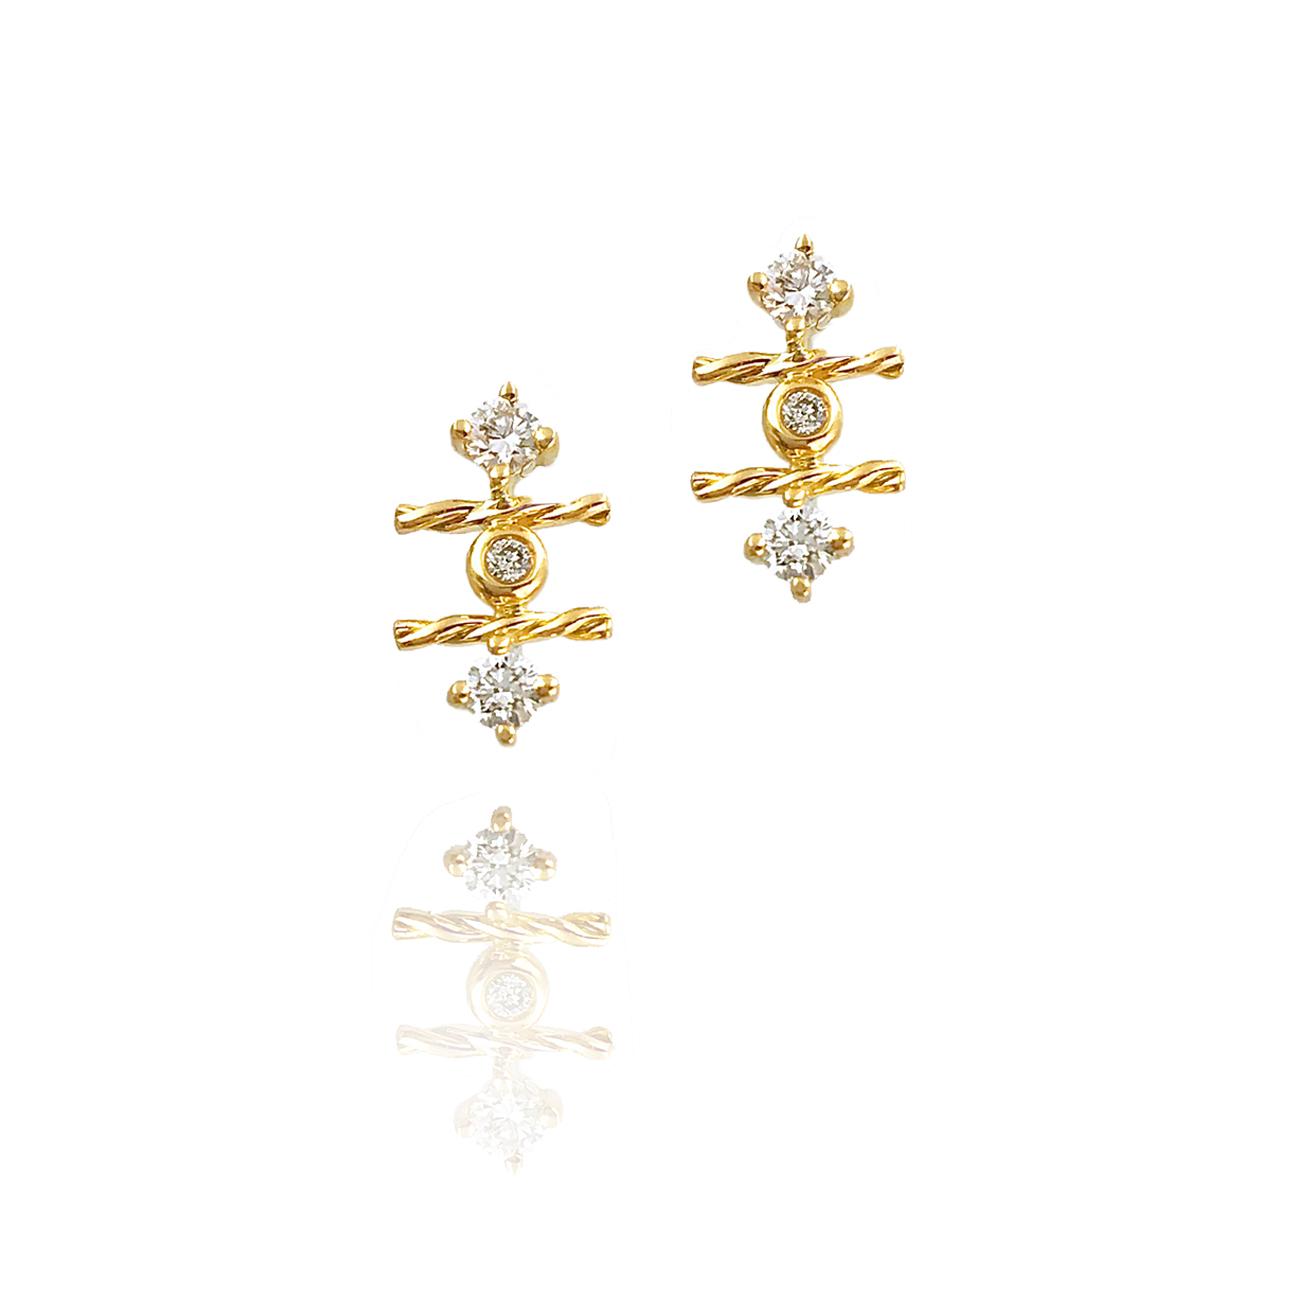 18k-gold-diamond-mix-setting-signature-twist-Stud-Earrings-jewelyrie-HAP-E-03